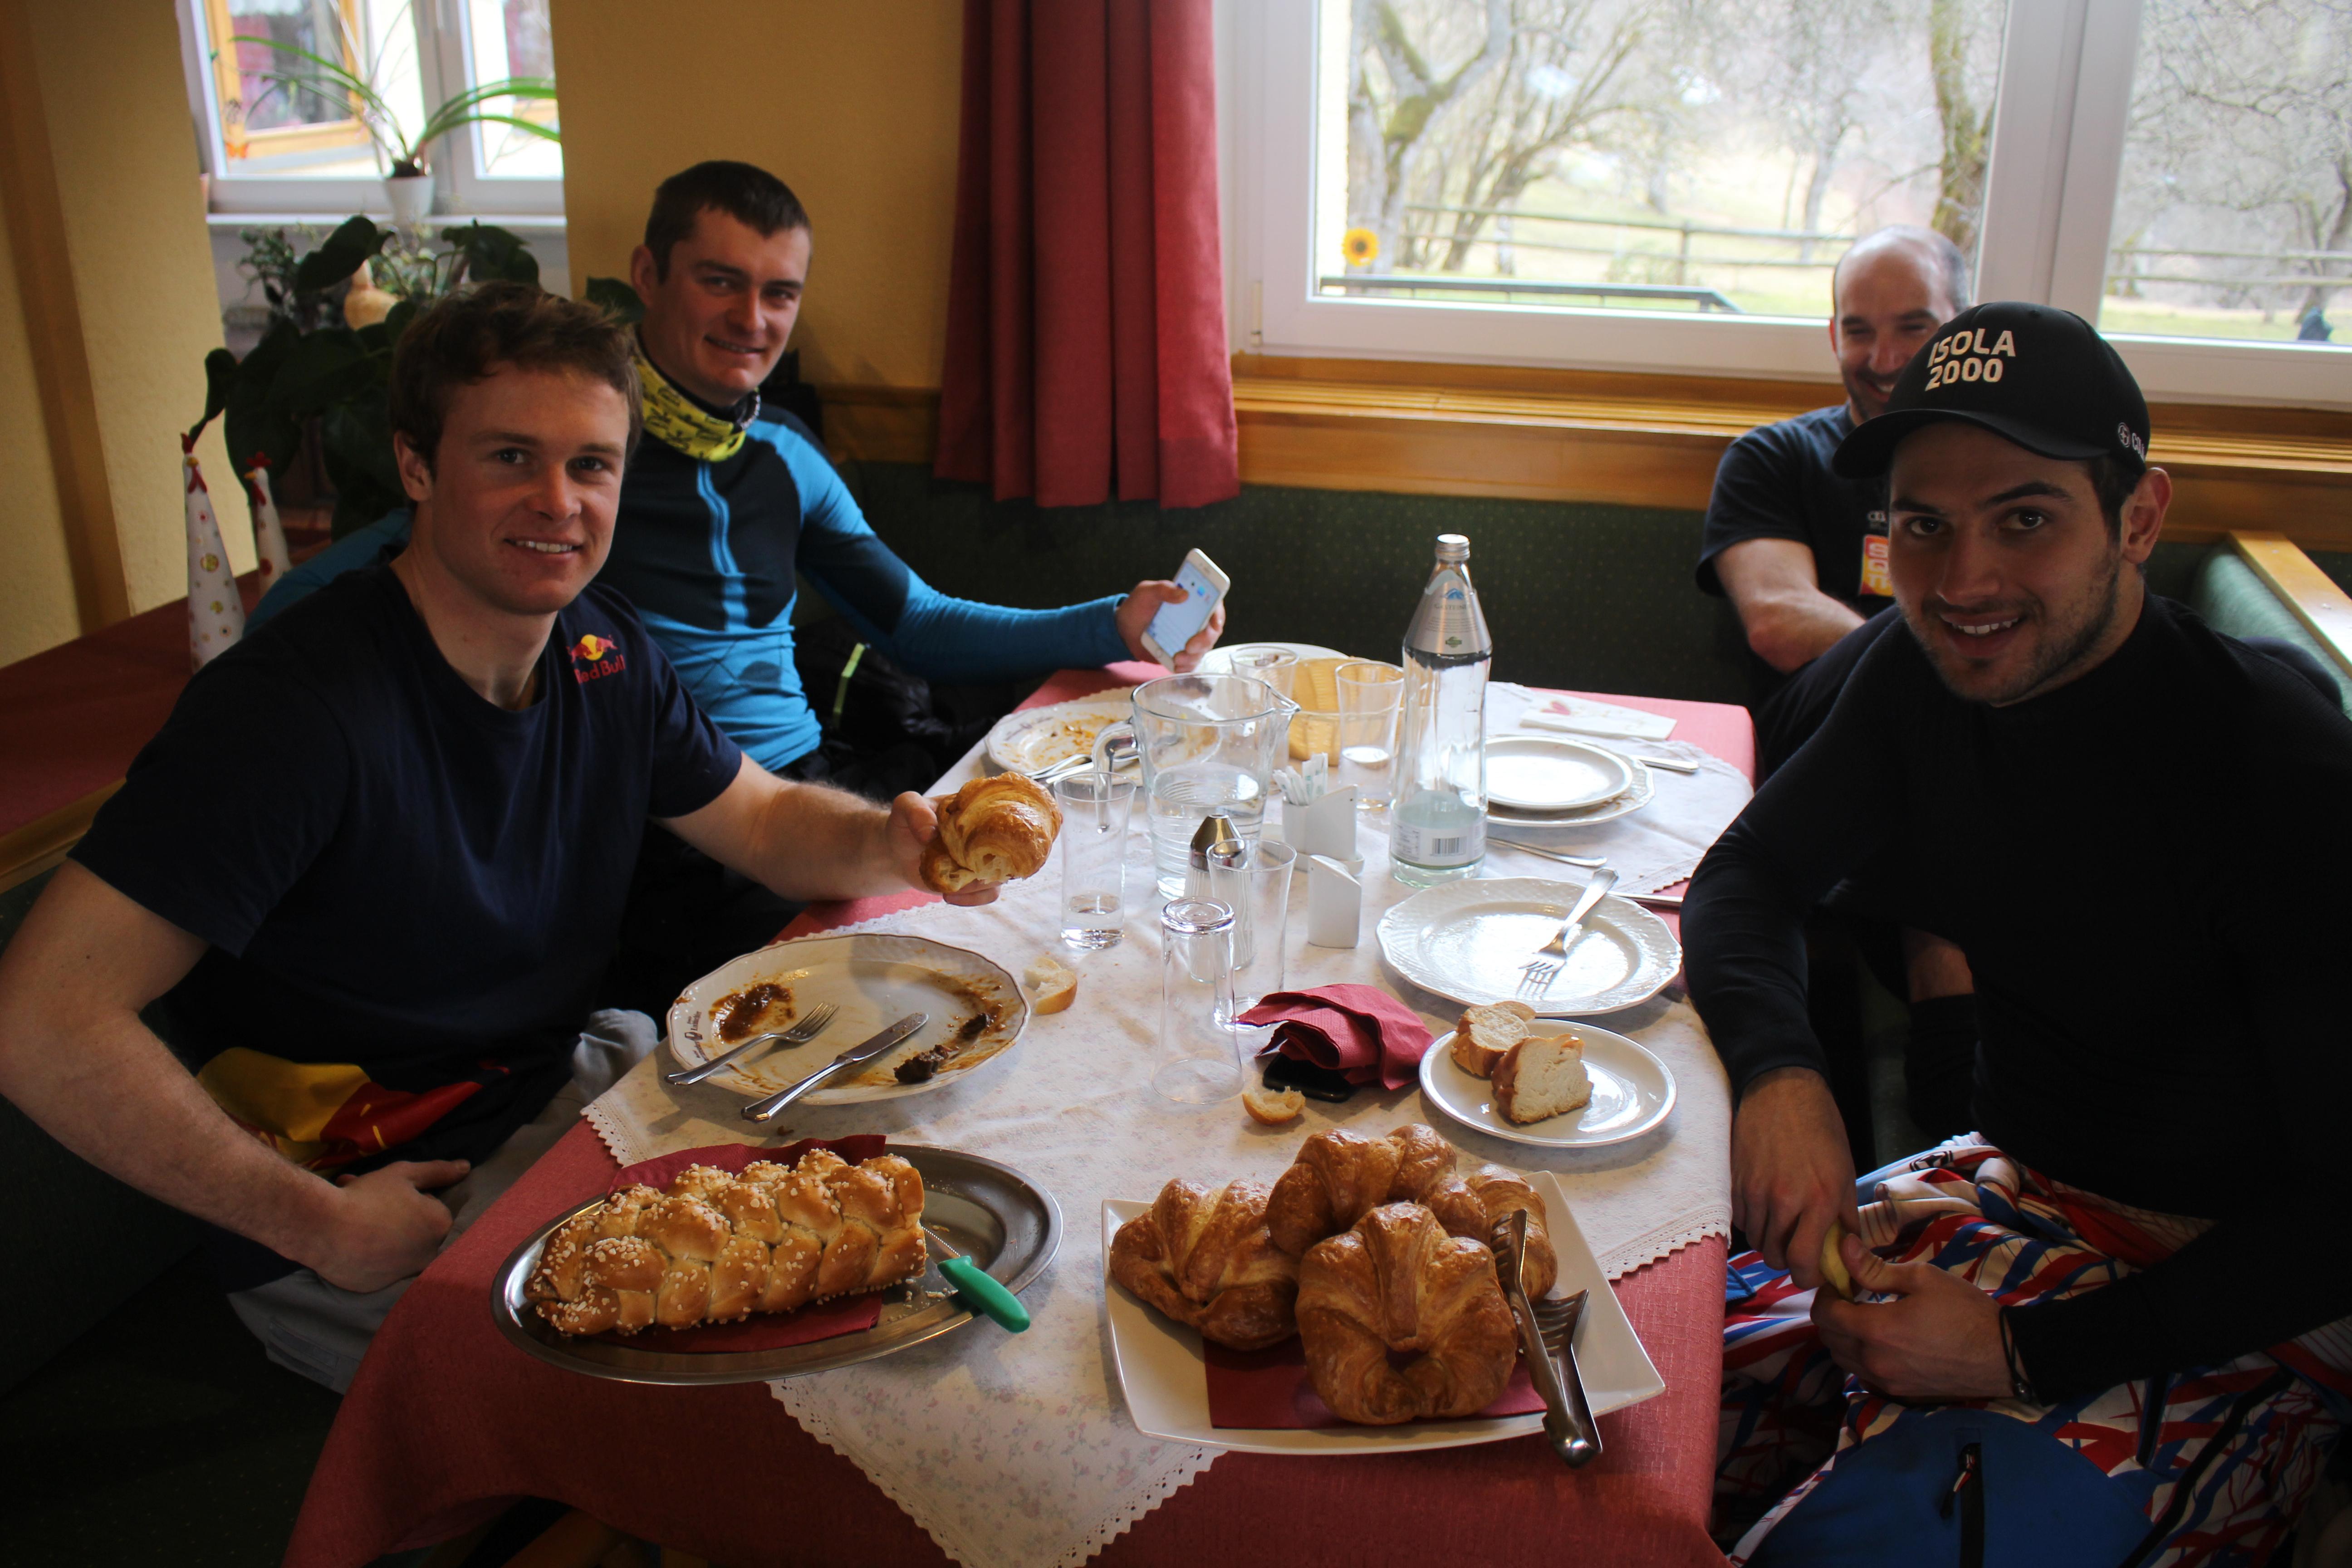 Alexis & Kollegen beim Frühstück